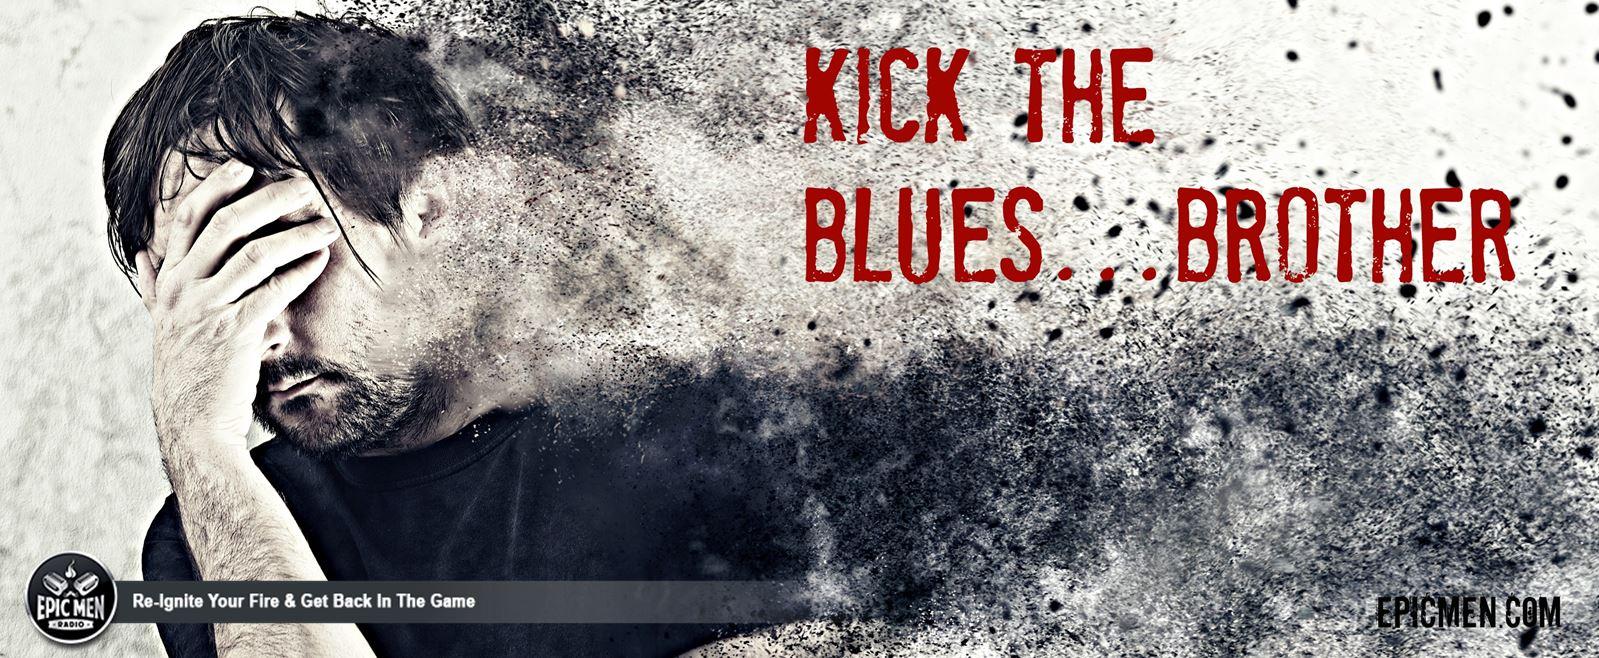 Kick The Blues with Radio tag